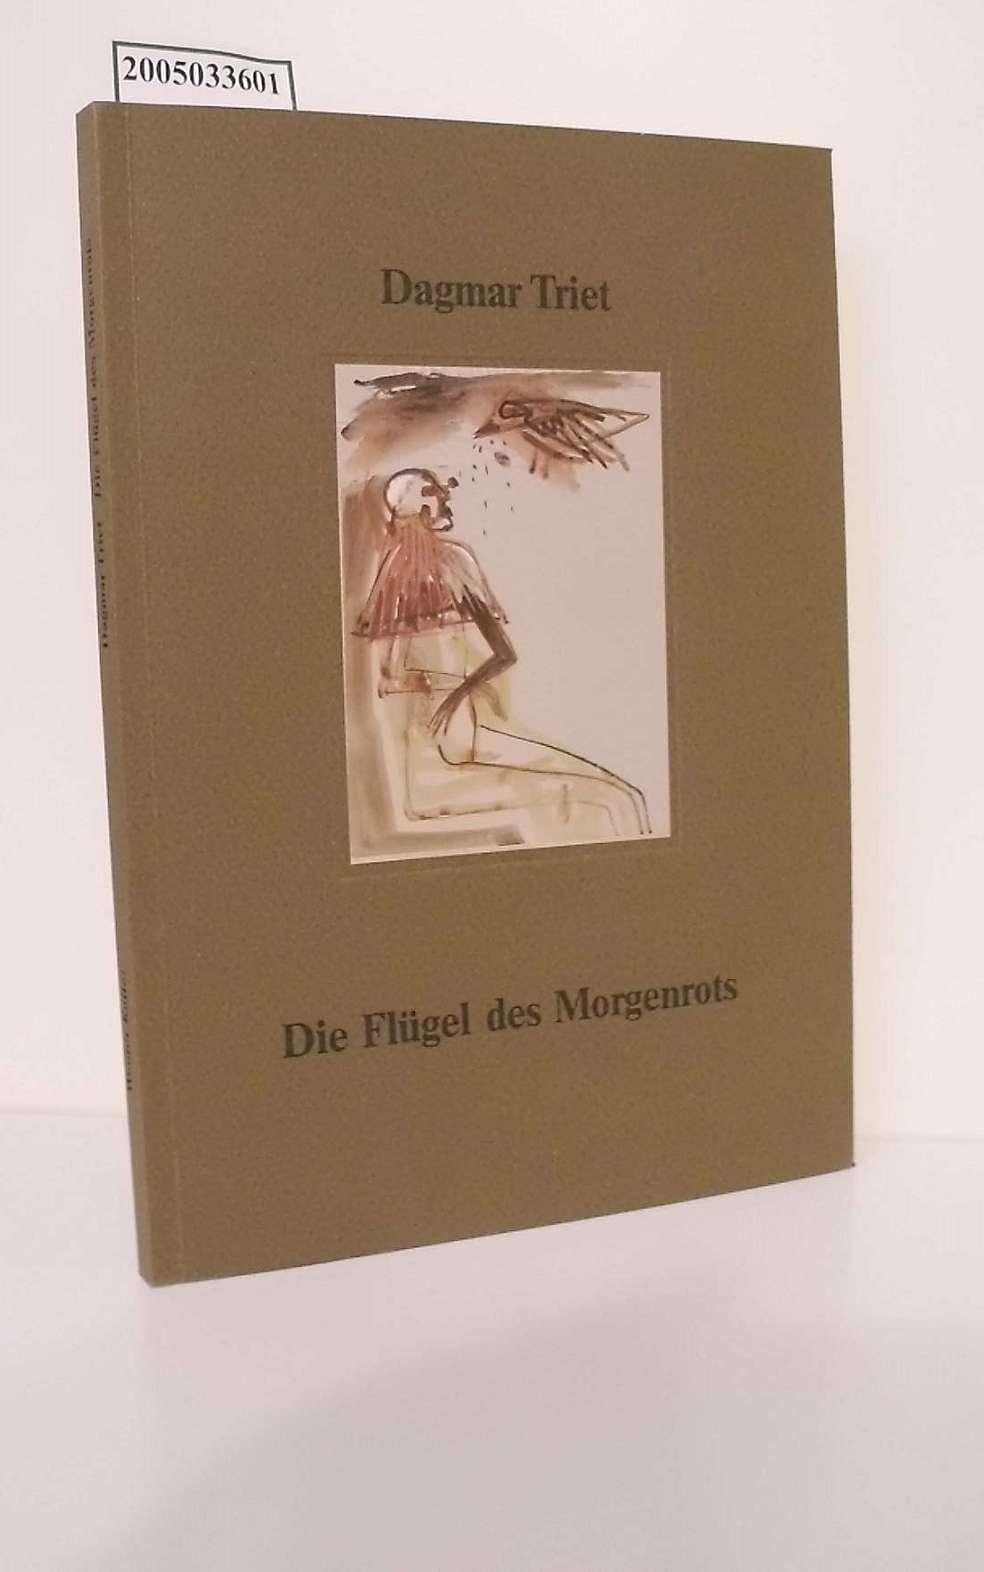 Dagmar Triet / Die Flügel des Morgenrots / signiert / Stadtmuseum Ratingen, 30. Juni - 25. August 1991 / [Text Wouter Kotte. Katalog Dagmar Triet ; Nahl Nucha] / Stadtmuseum (Ratingen): Ratinger Museums-Reihe ; Nr. 2